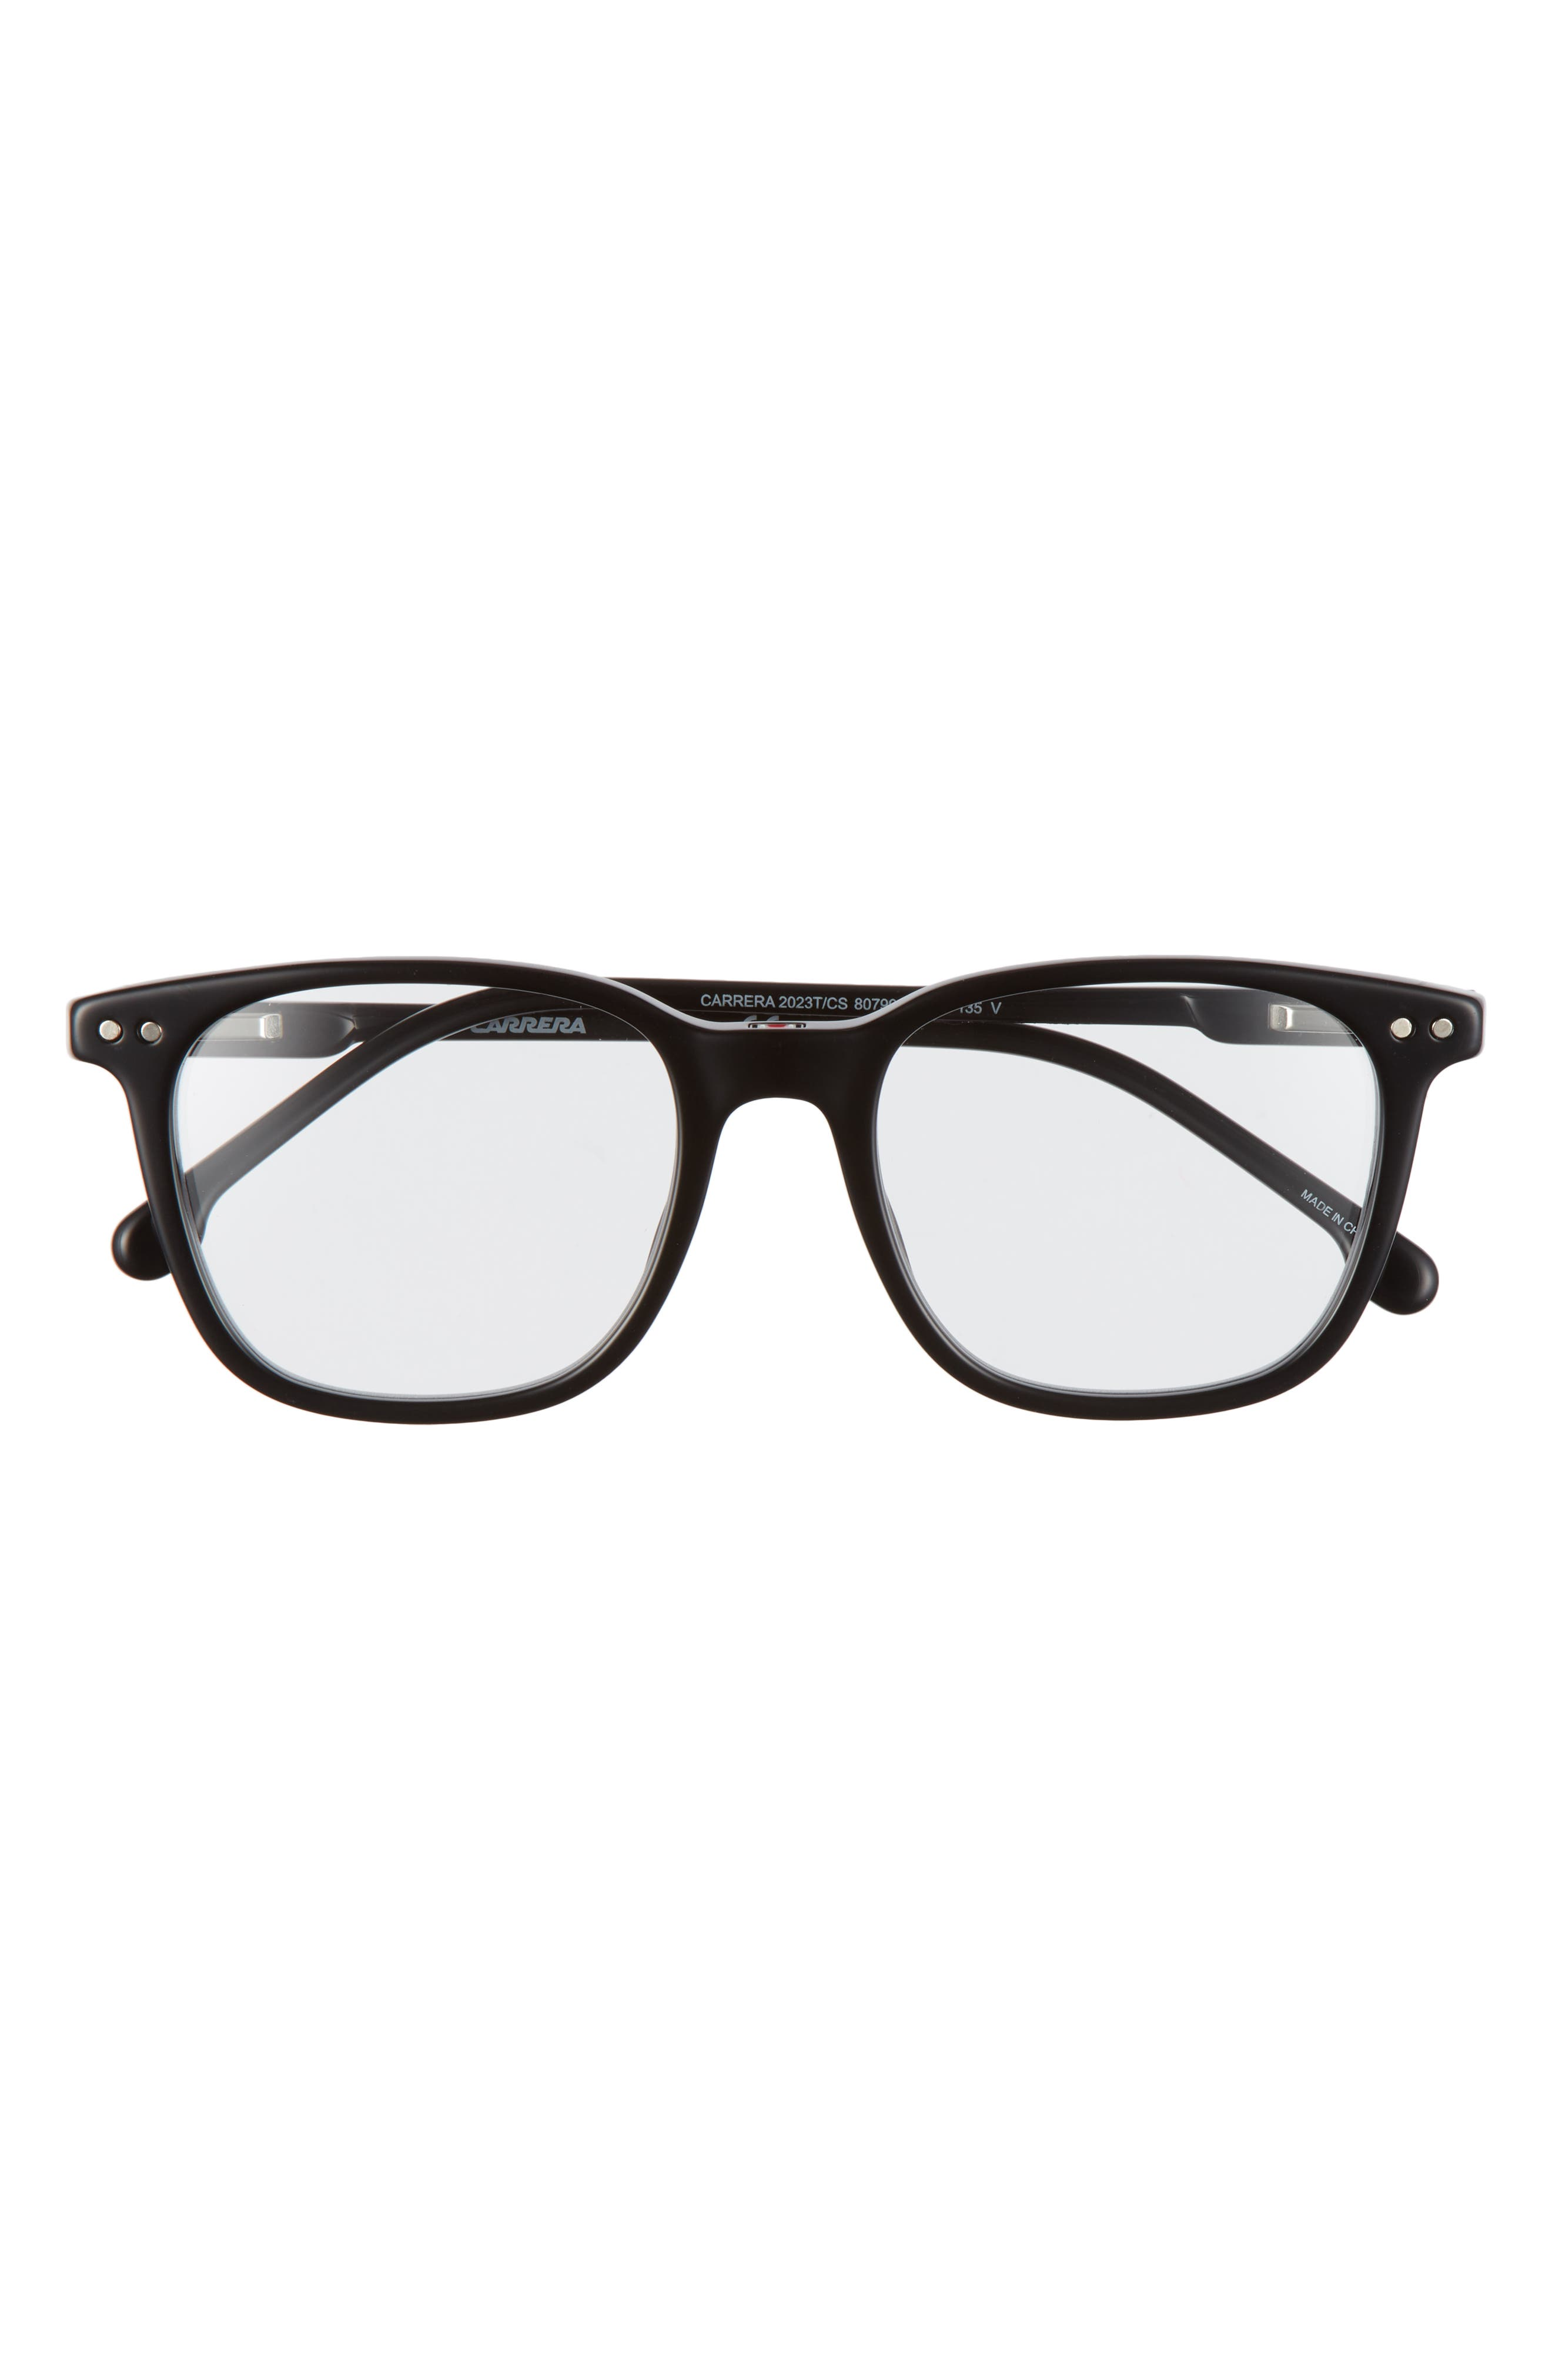 48mm Square Optical Glasses